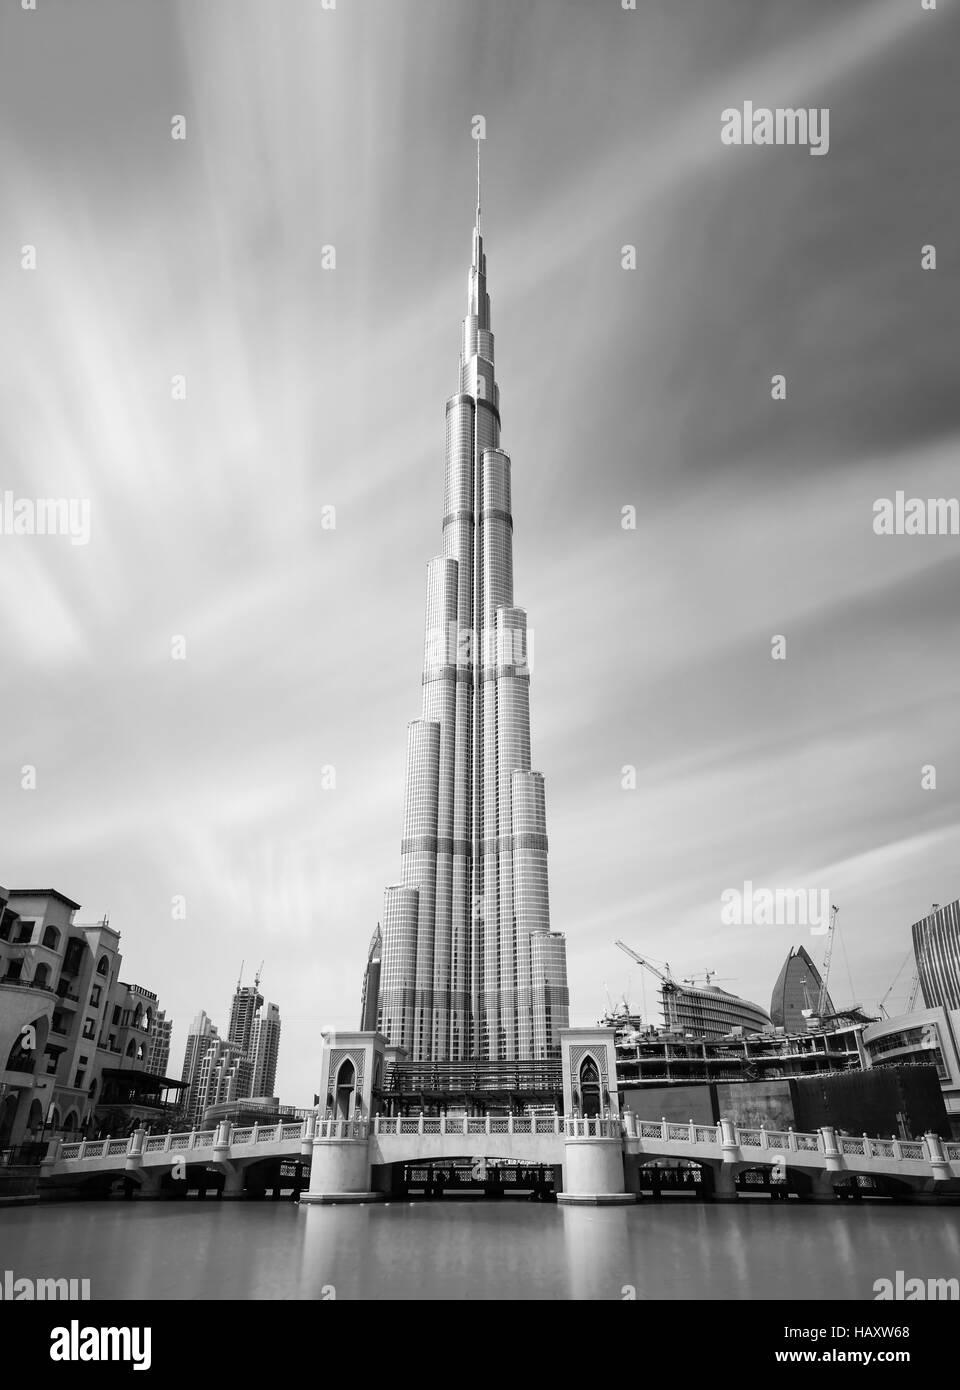 DUBAI, UNITED ARAB EMIRATES - FEBRUARY 29, 2016: View on Burj Khalifa tallest building in the world,Dubai,United Stock Photo